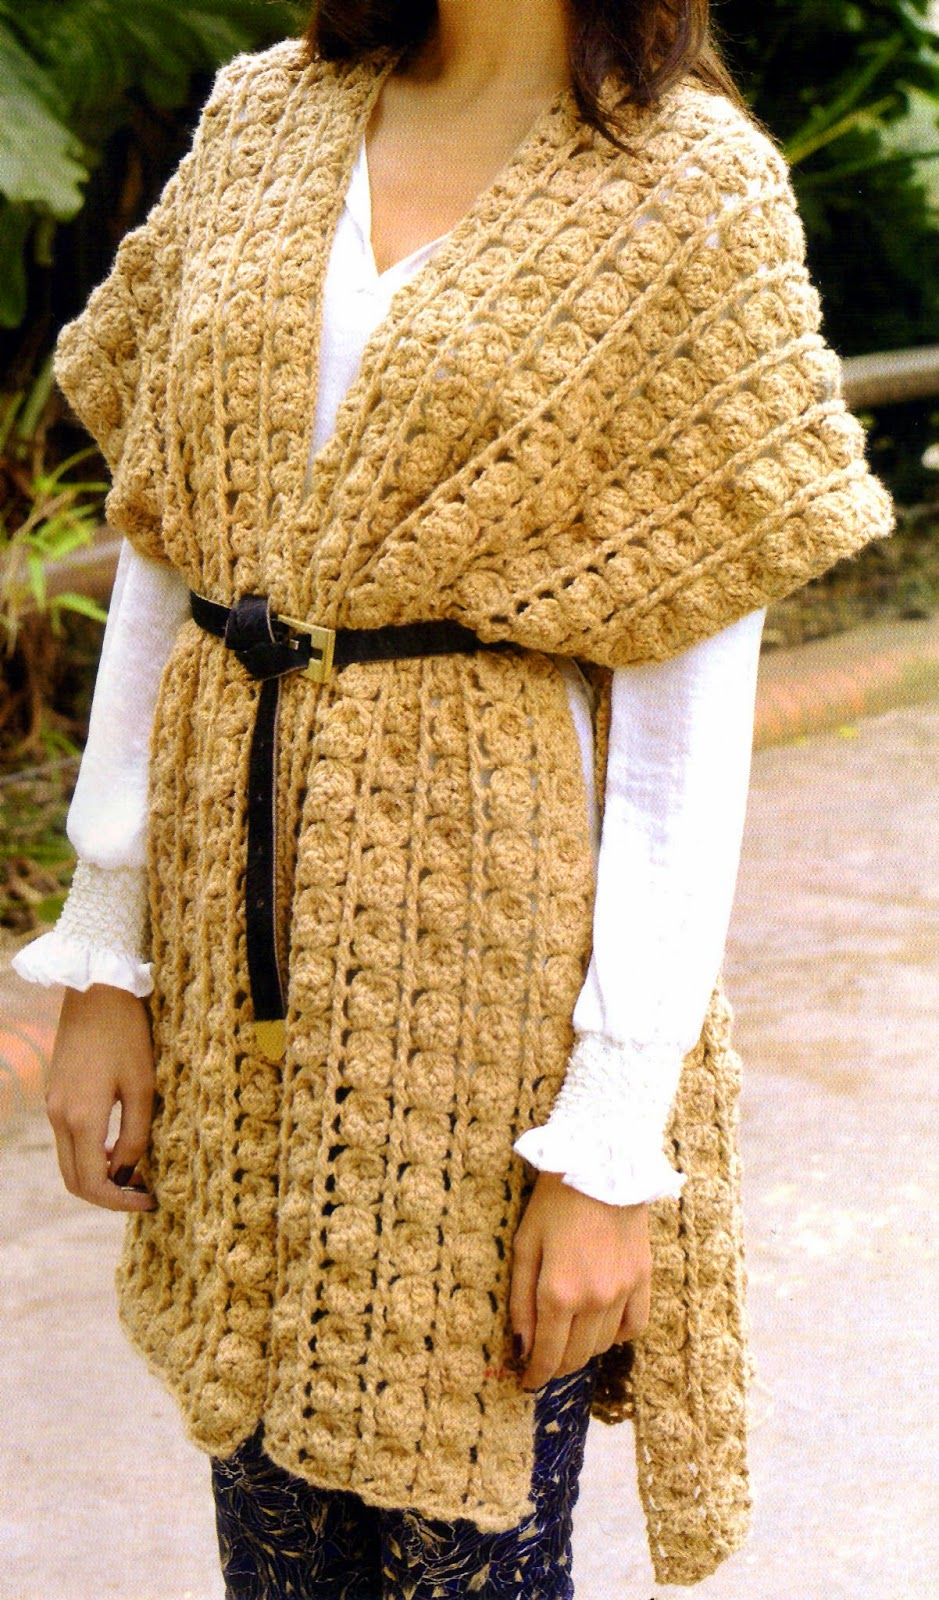 tejidos artesanales en crochet poncho chic tejido en crochet. Black Bedroom Furniture Sets. Home Design Ideas